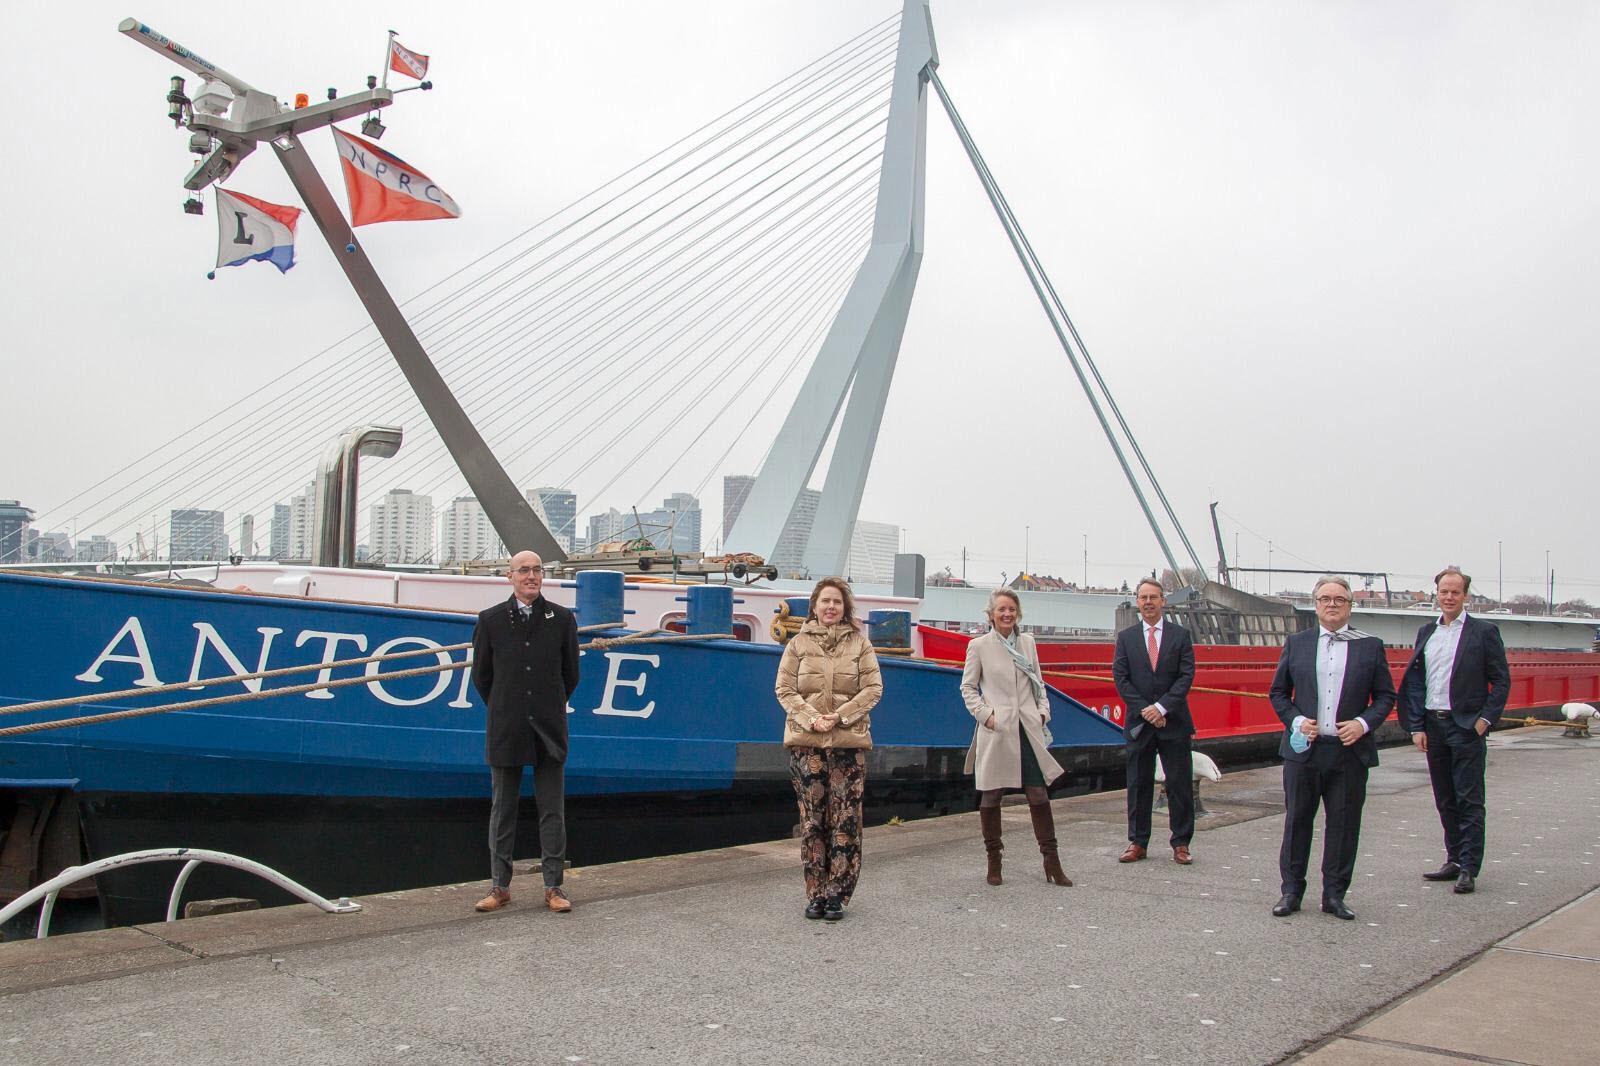 fuelcellsworks, Dutch H2 Inland Navigation Sets Sail